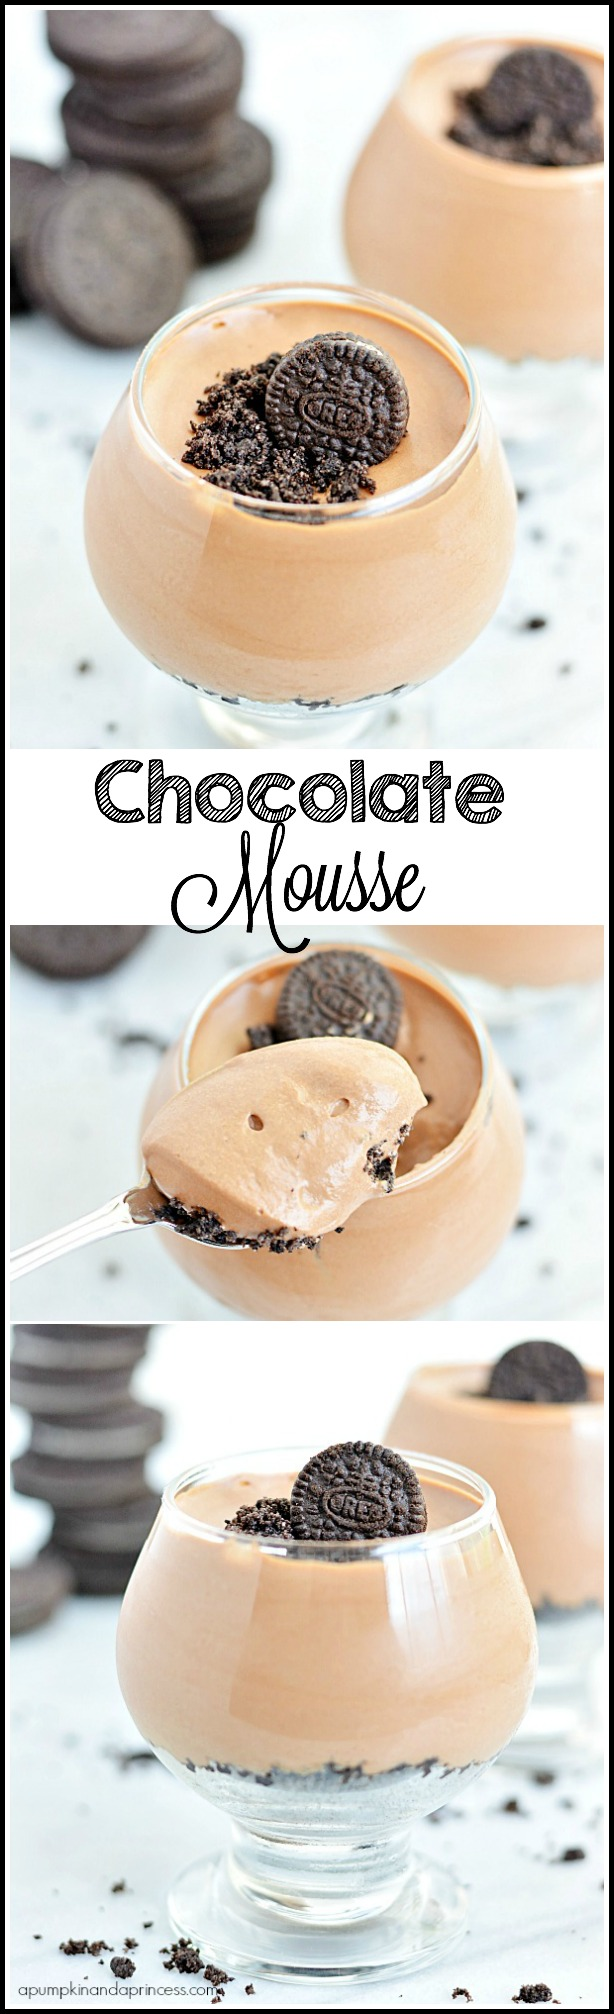 Oreo Crumb Chocolate Mousse